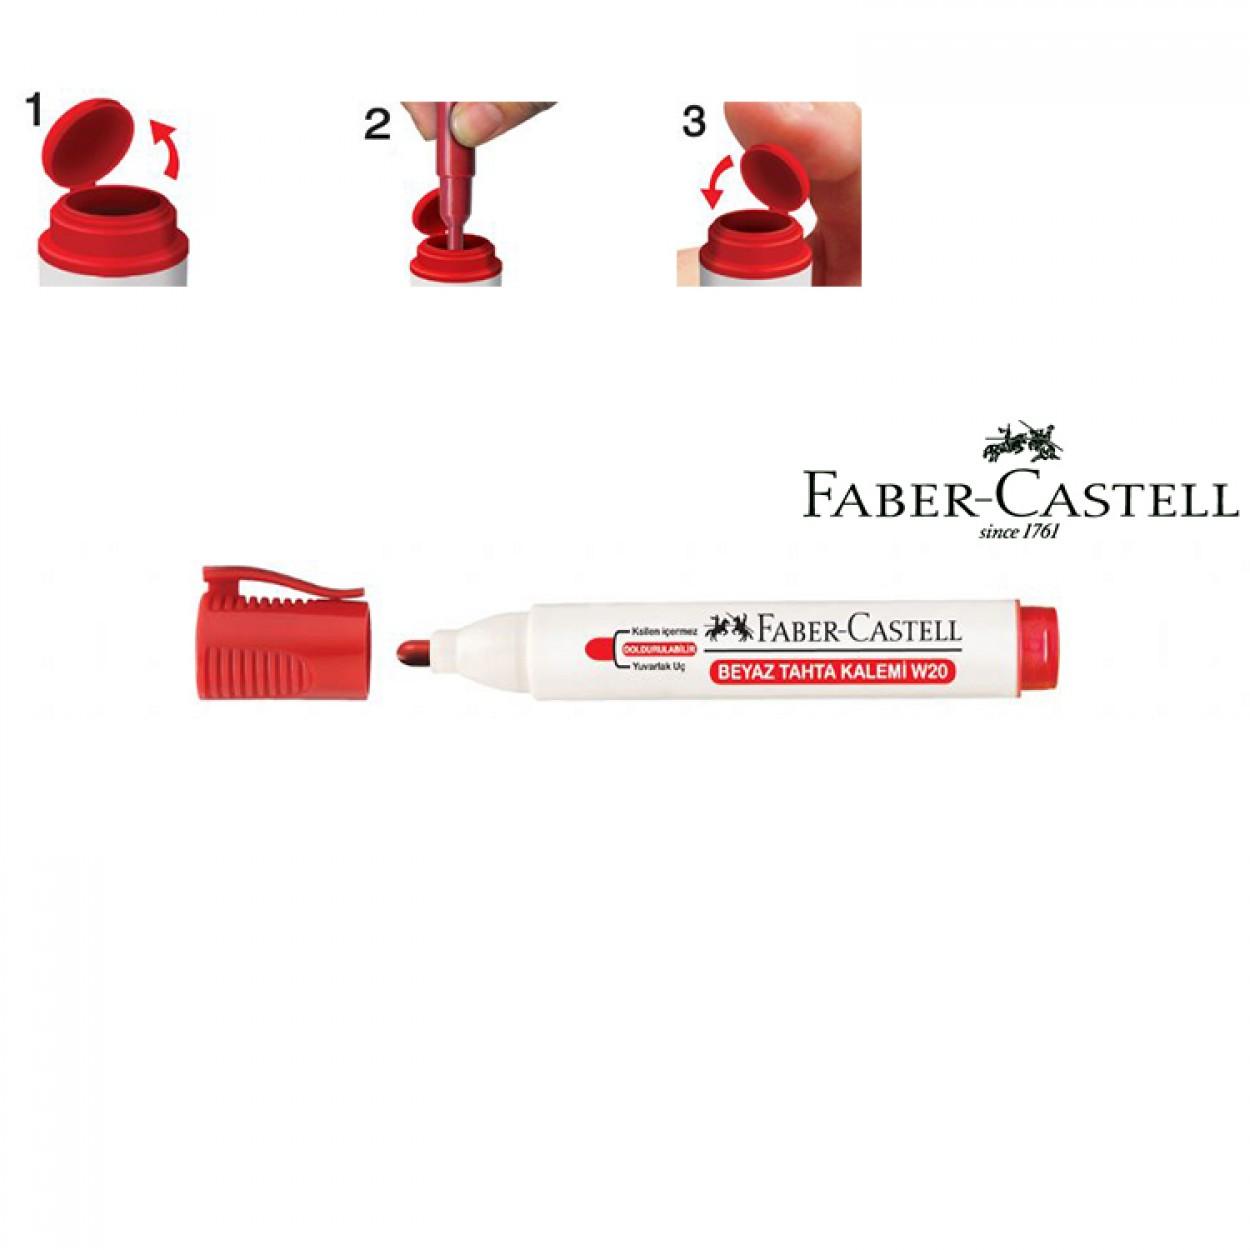 Faber-Castell Beyaz Tahta Kalemi W20 Kırmızı 10'Lu